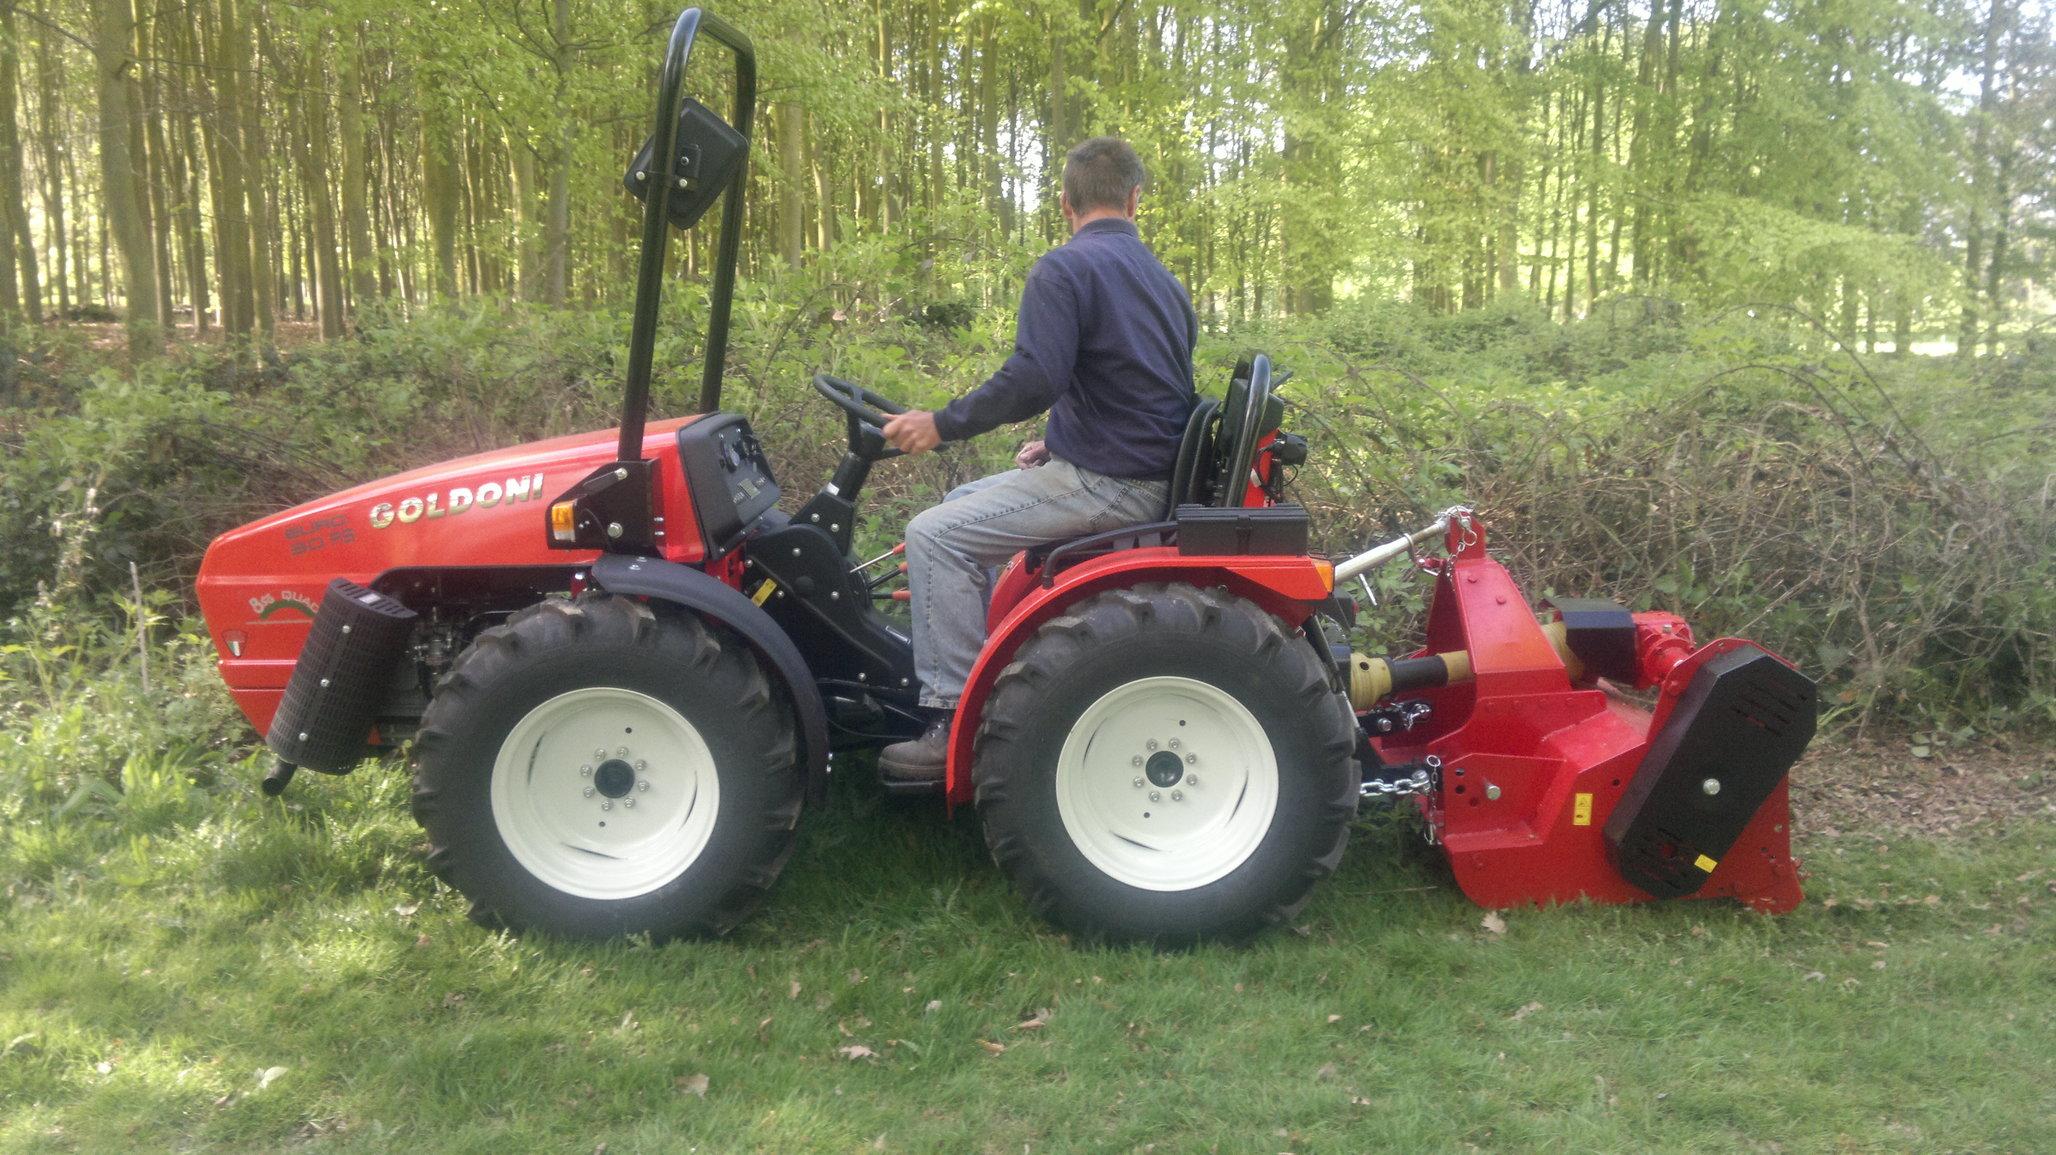 Goldoni Tractor Parts : Goldoni tractor euro rs bsg tractors